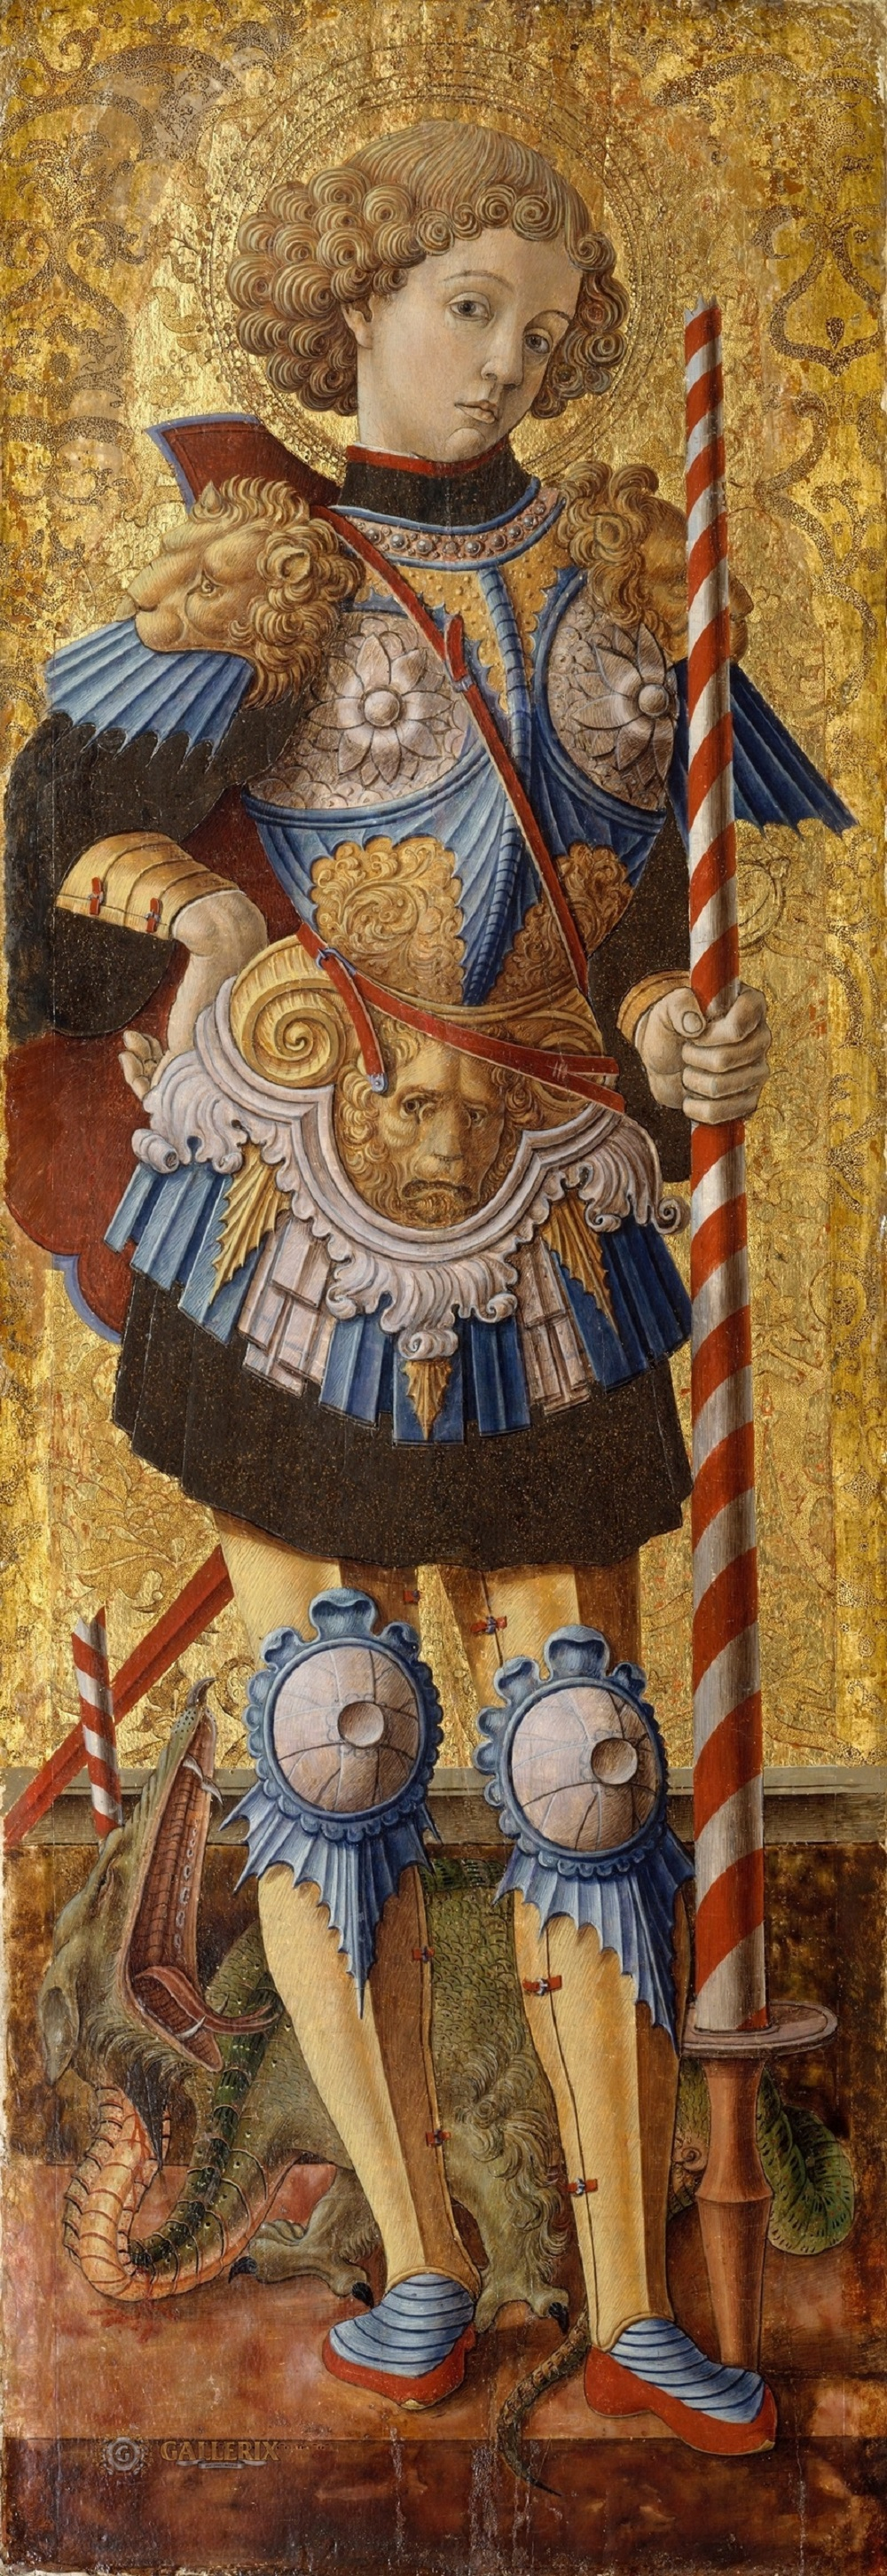 1472 CRIVELLI, Carlo St George 1472 Tempera on panel, 97 x 34 cm Metropolitan Museum of Art, New York.jpg